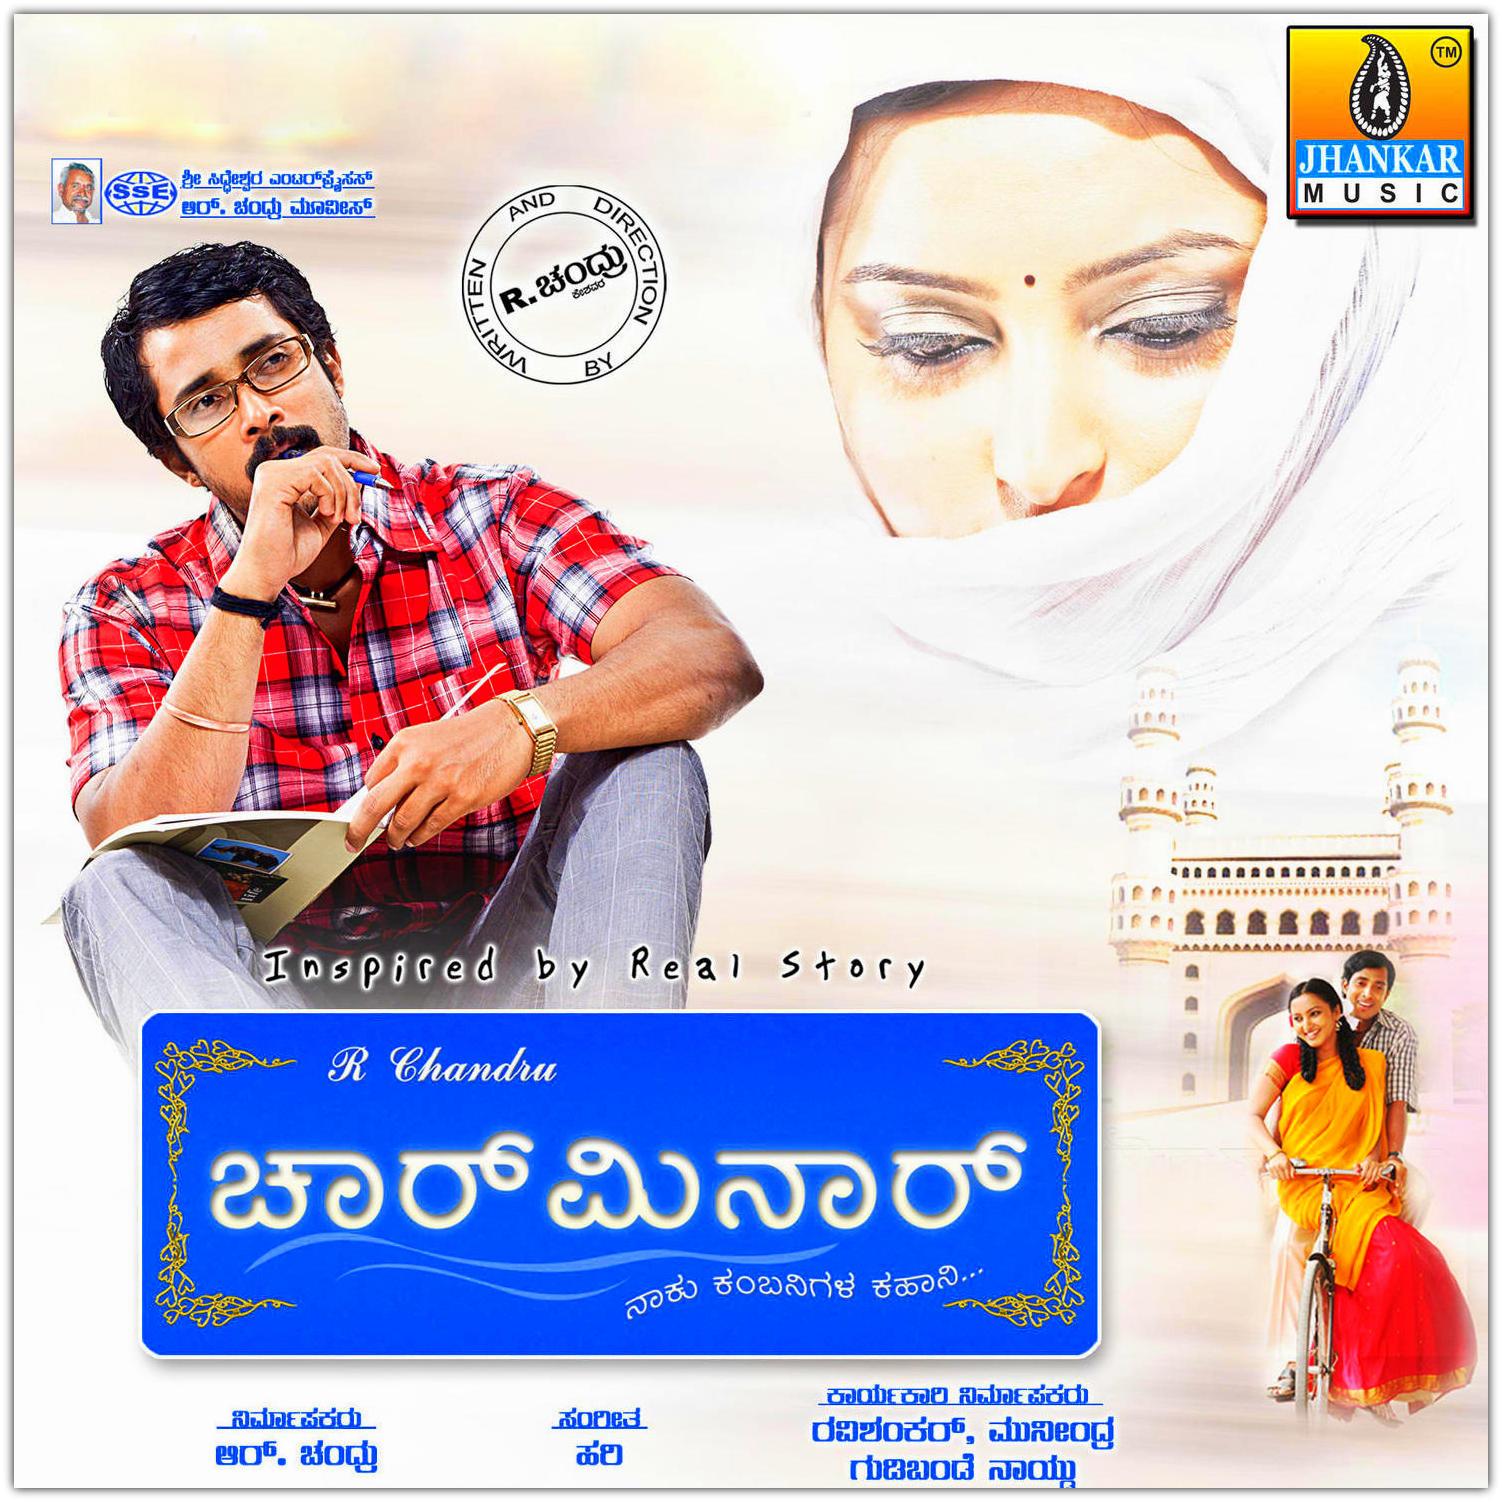 New Song No Need Mp3: Kannada Mp3 Songs: February 2013